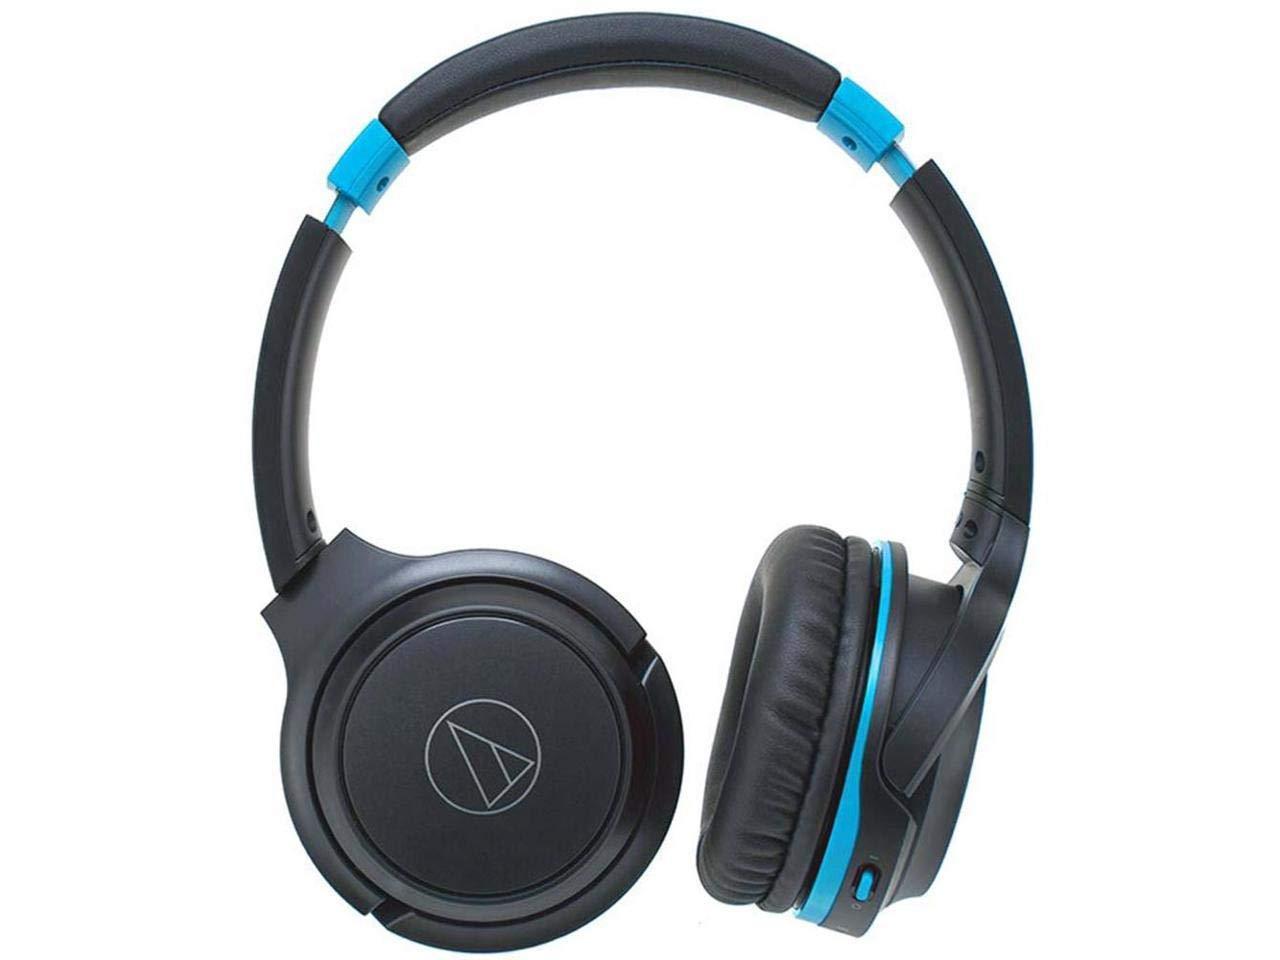 Audio-technica ATH-S200BT Wireless Headphones